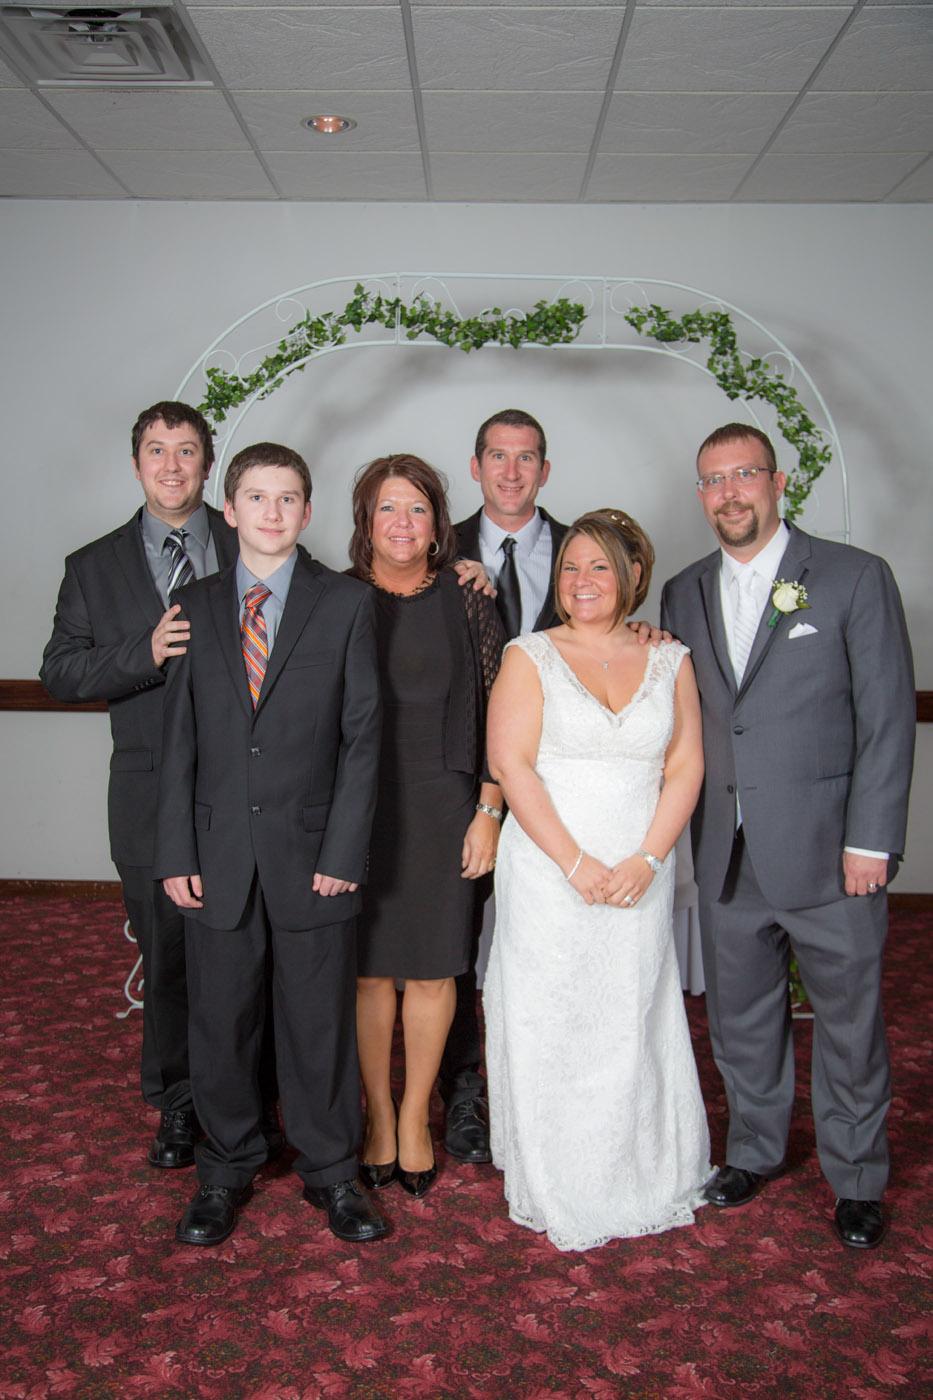 Healy Wedding 1 1424.jpg